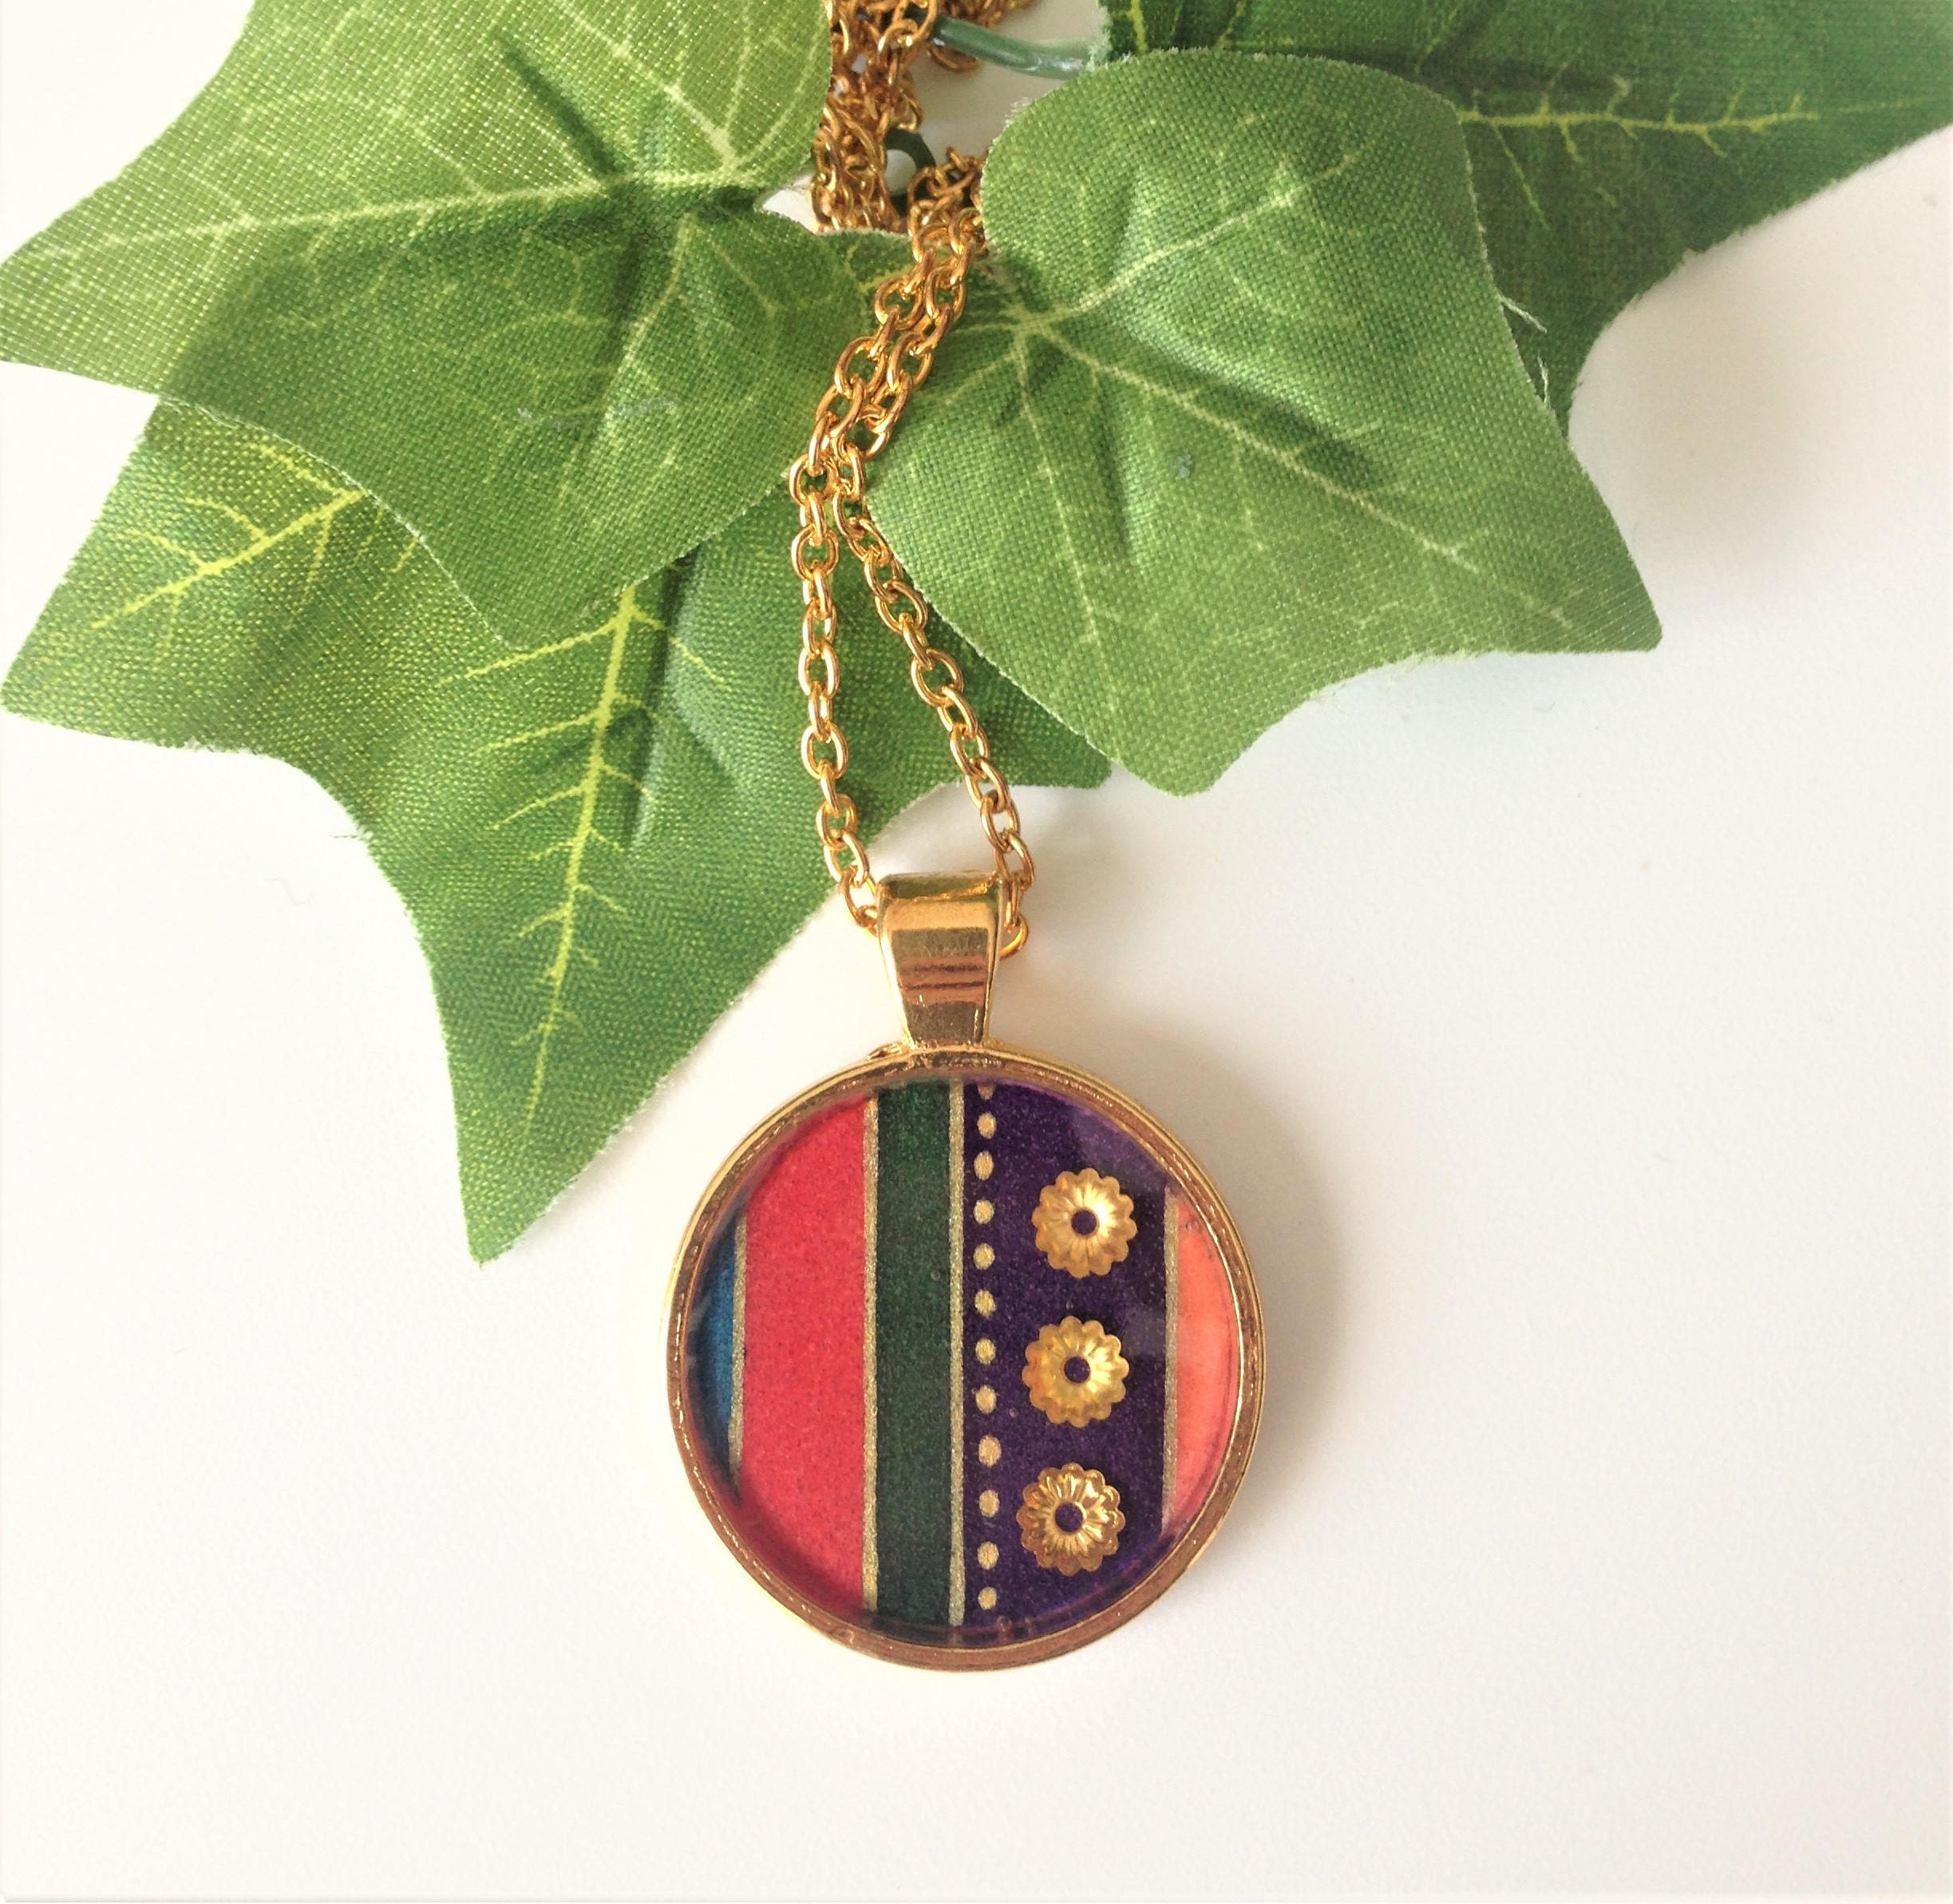 Handmade Graphic Design Pendant Necklace  Handmade Stripes Resin Necklace  Resin Pendant Necklace  Jewellery Gifts  Handmade Jewellery